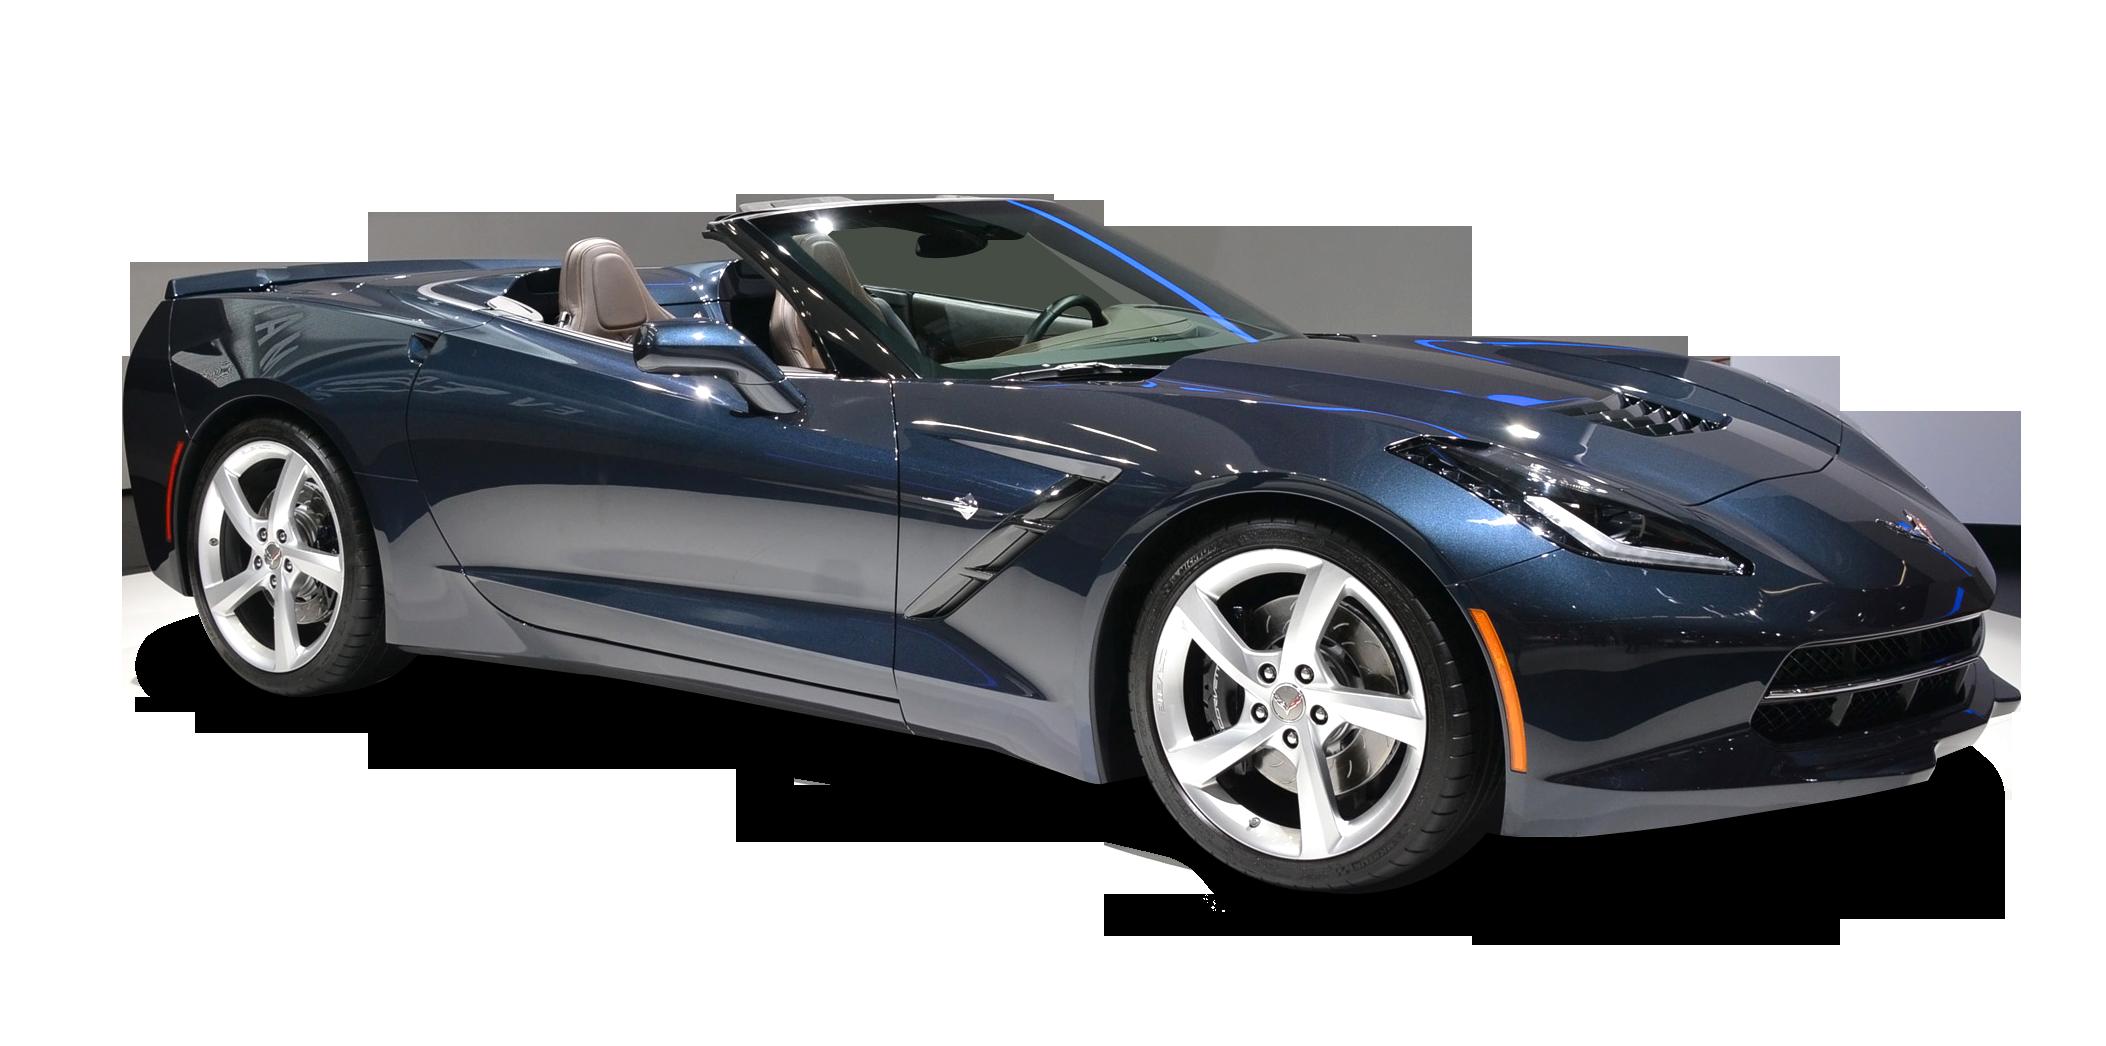 Download Chevrolet Corvette Stingray Convertible Car Png Image For Free Chevrolet Corvette Stingray Corvette Stingray Chevrolet Corvette